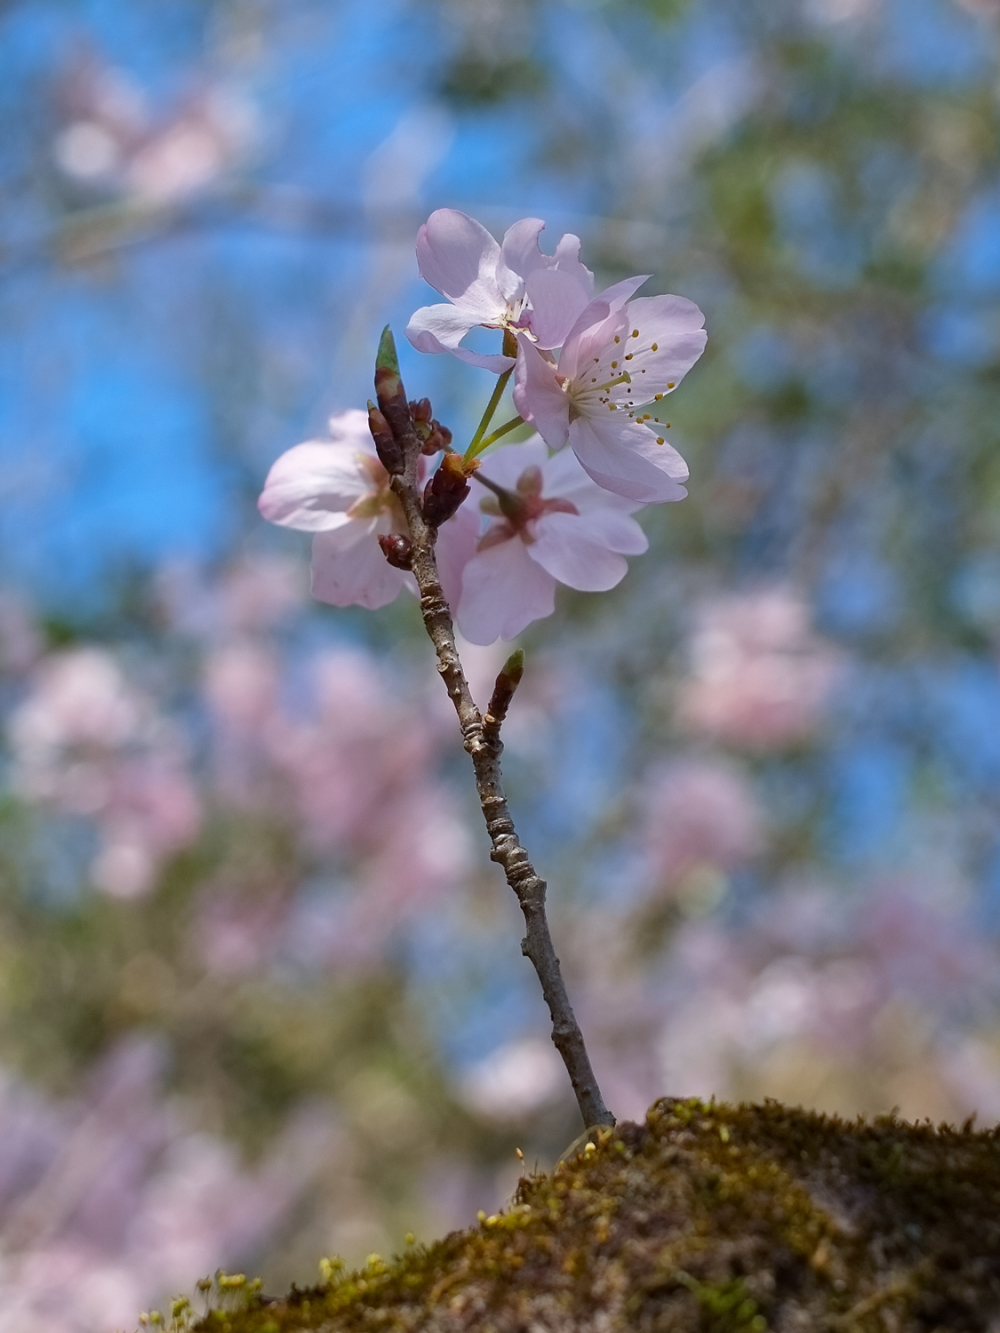 Spring Flowers - 3 - (2020 Mar.)